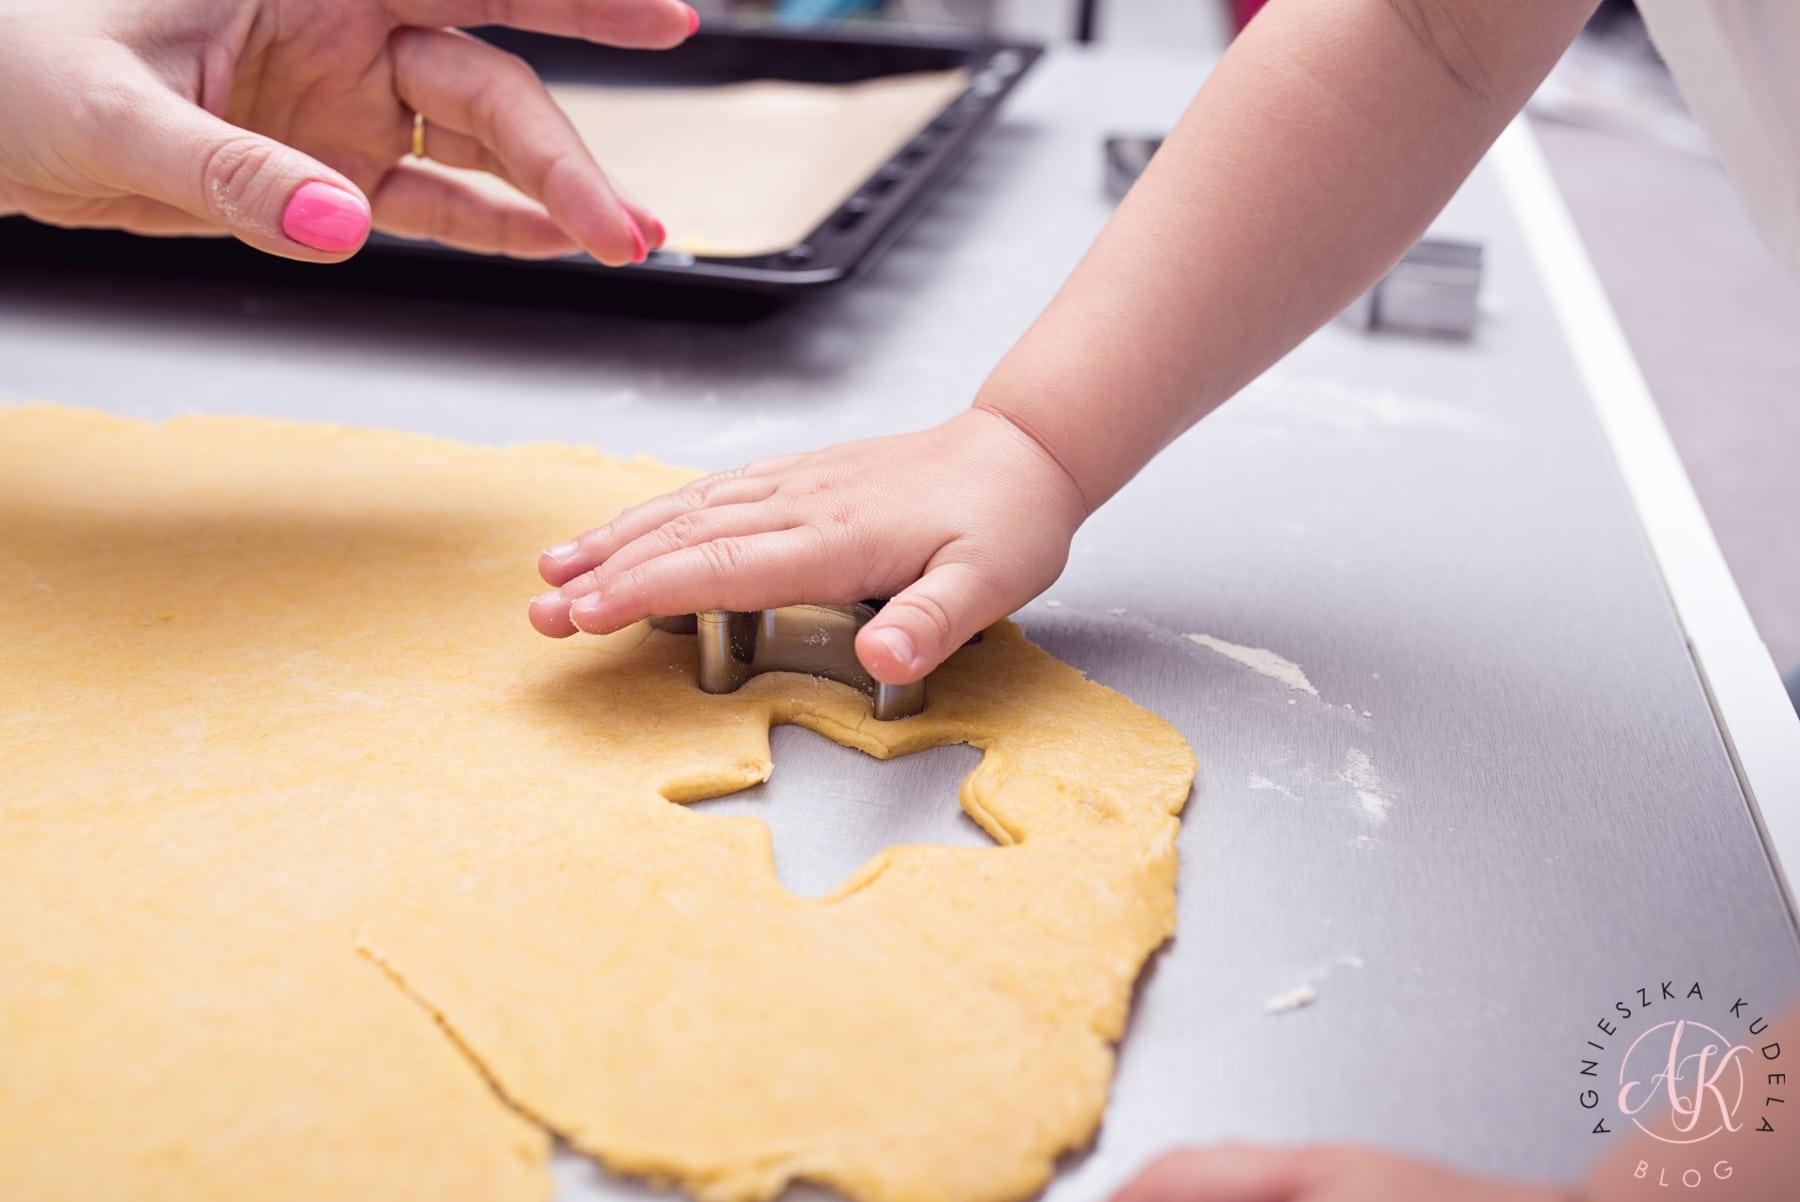 ciasteczka bez laktozy przepis